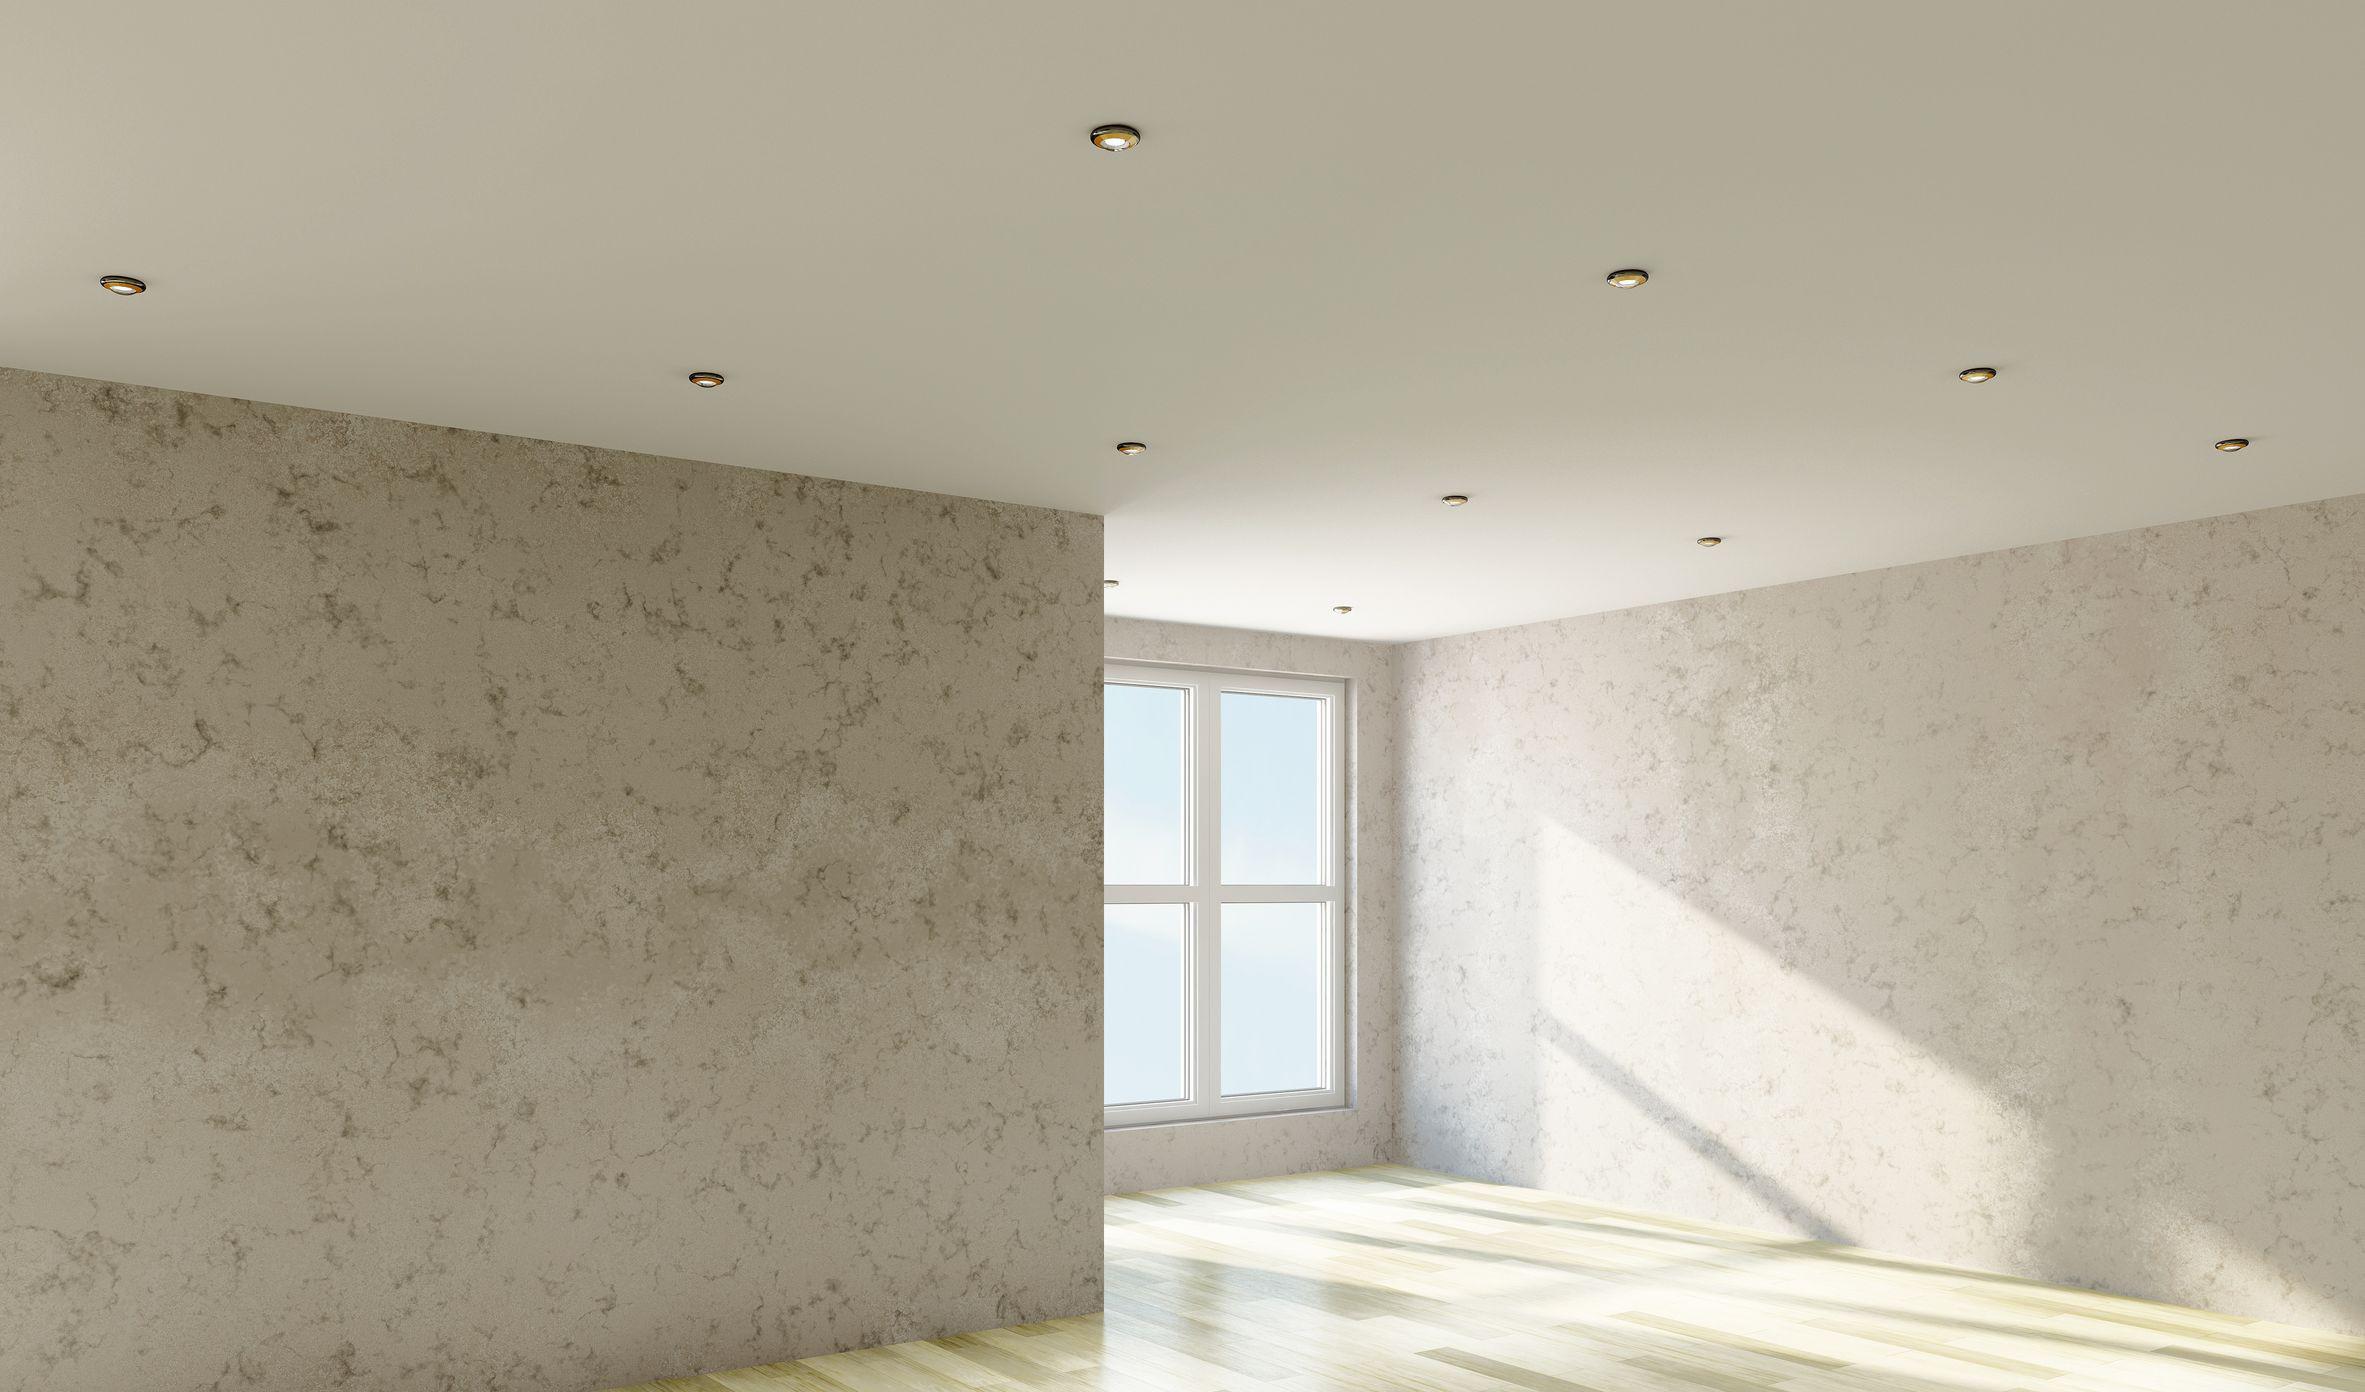 decken best flur lampen led exquisit flurlampen georgina chrom h lampe de decke modern mit with. Black Bedroom Furniture Sets. Home Design Ideas